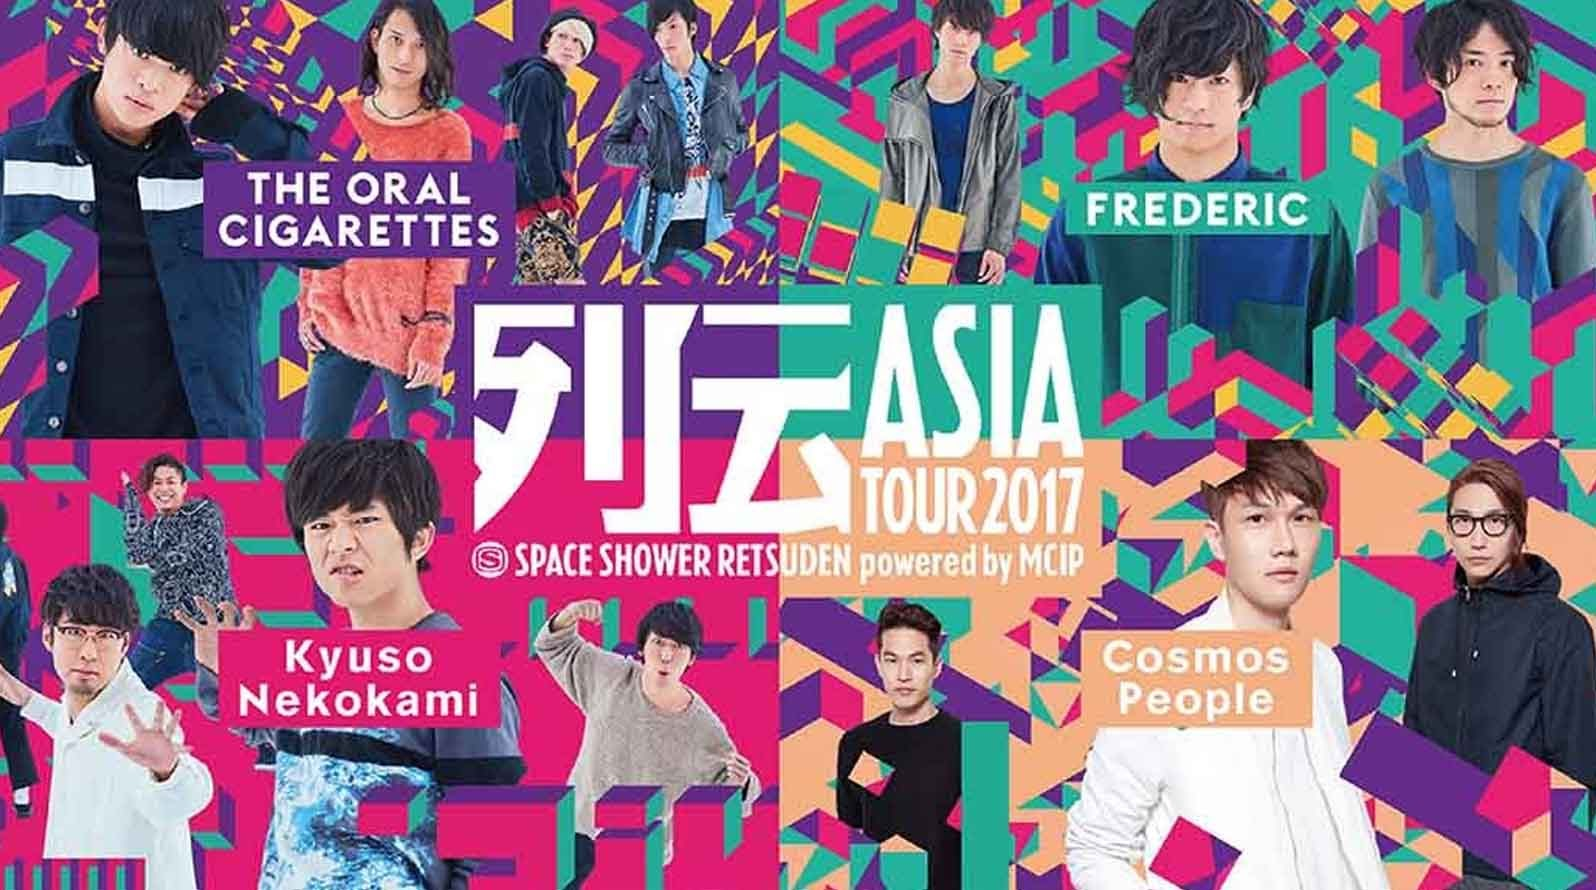 【迷迷歌單】SPACE SHOWER 列傳 ASIA TOUR 2017 powered by MCIP